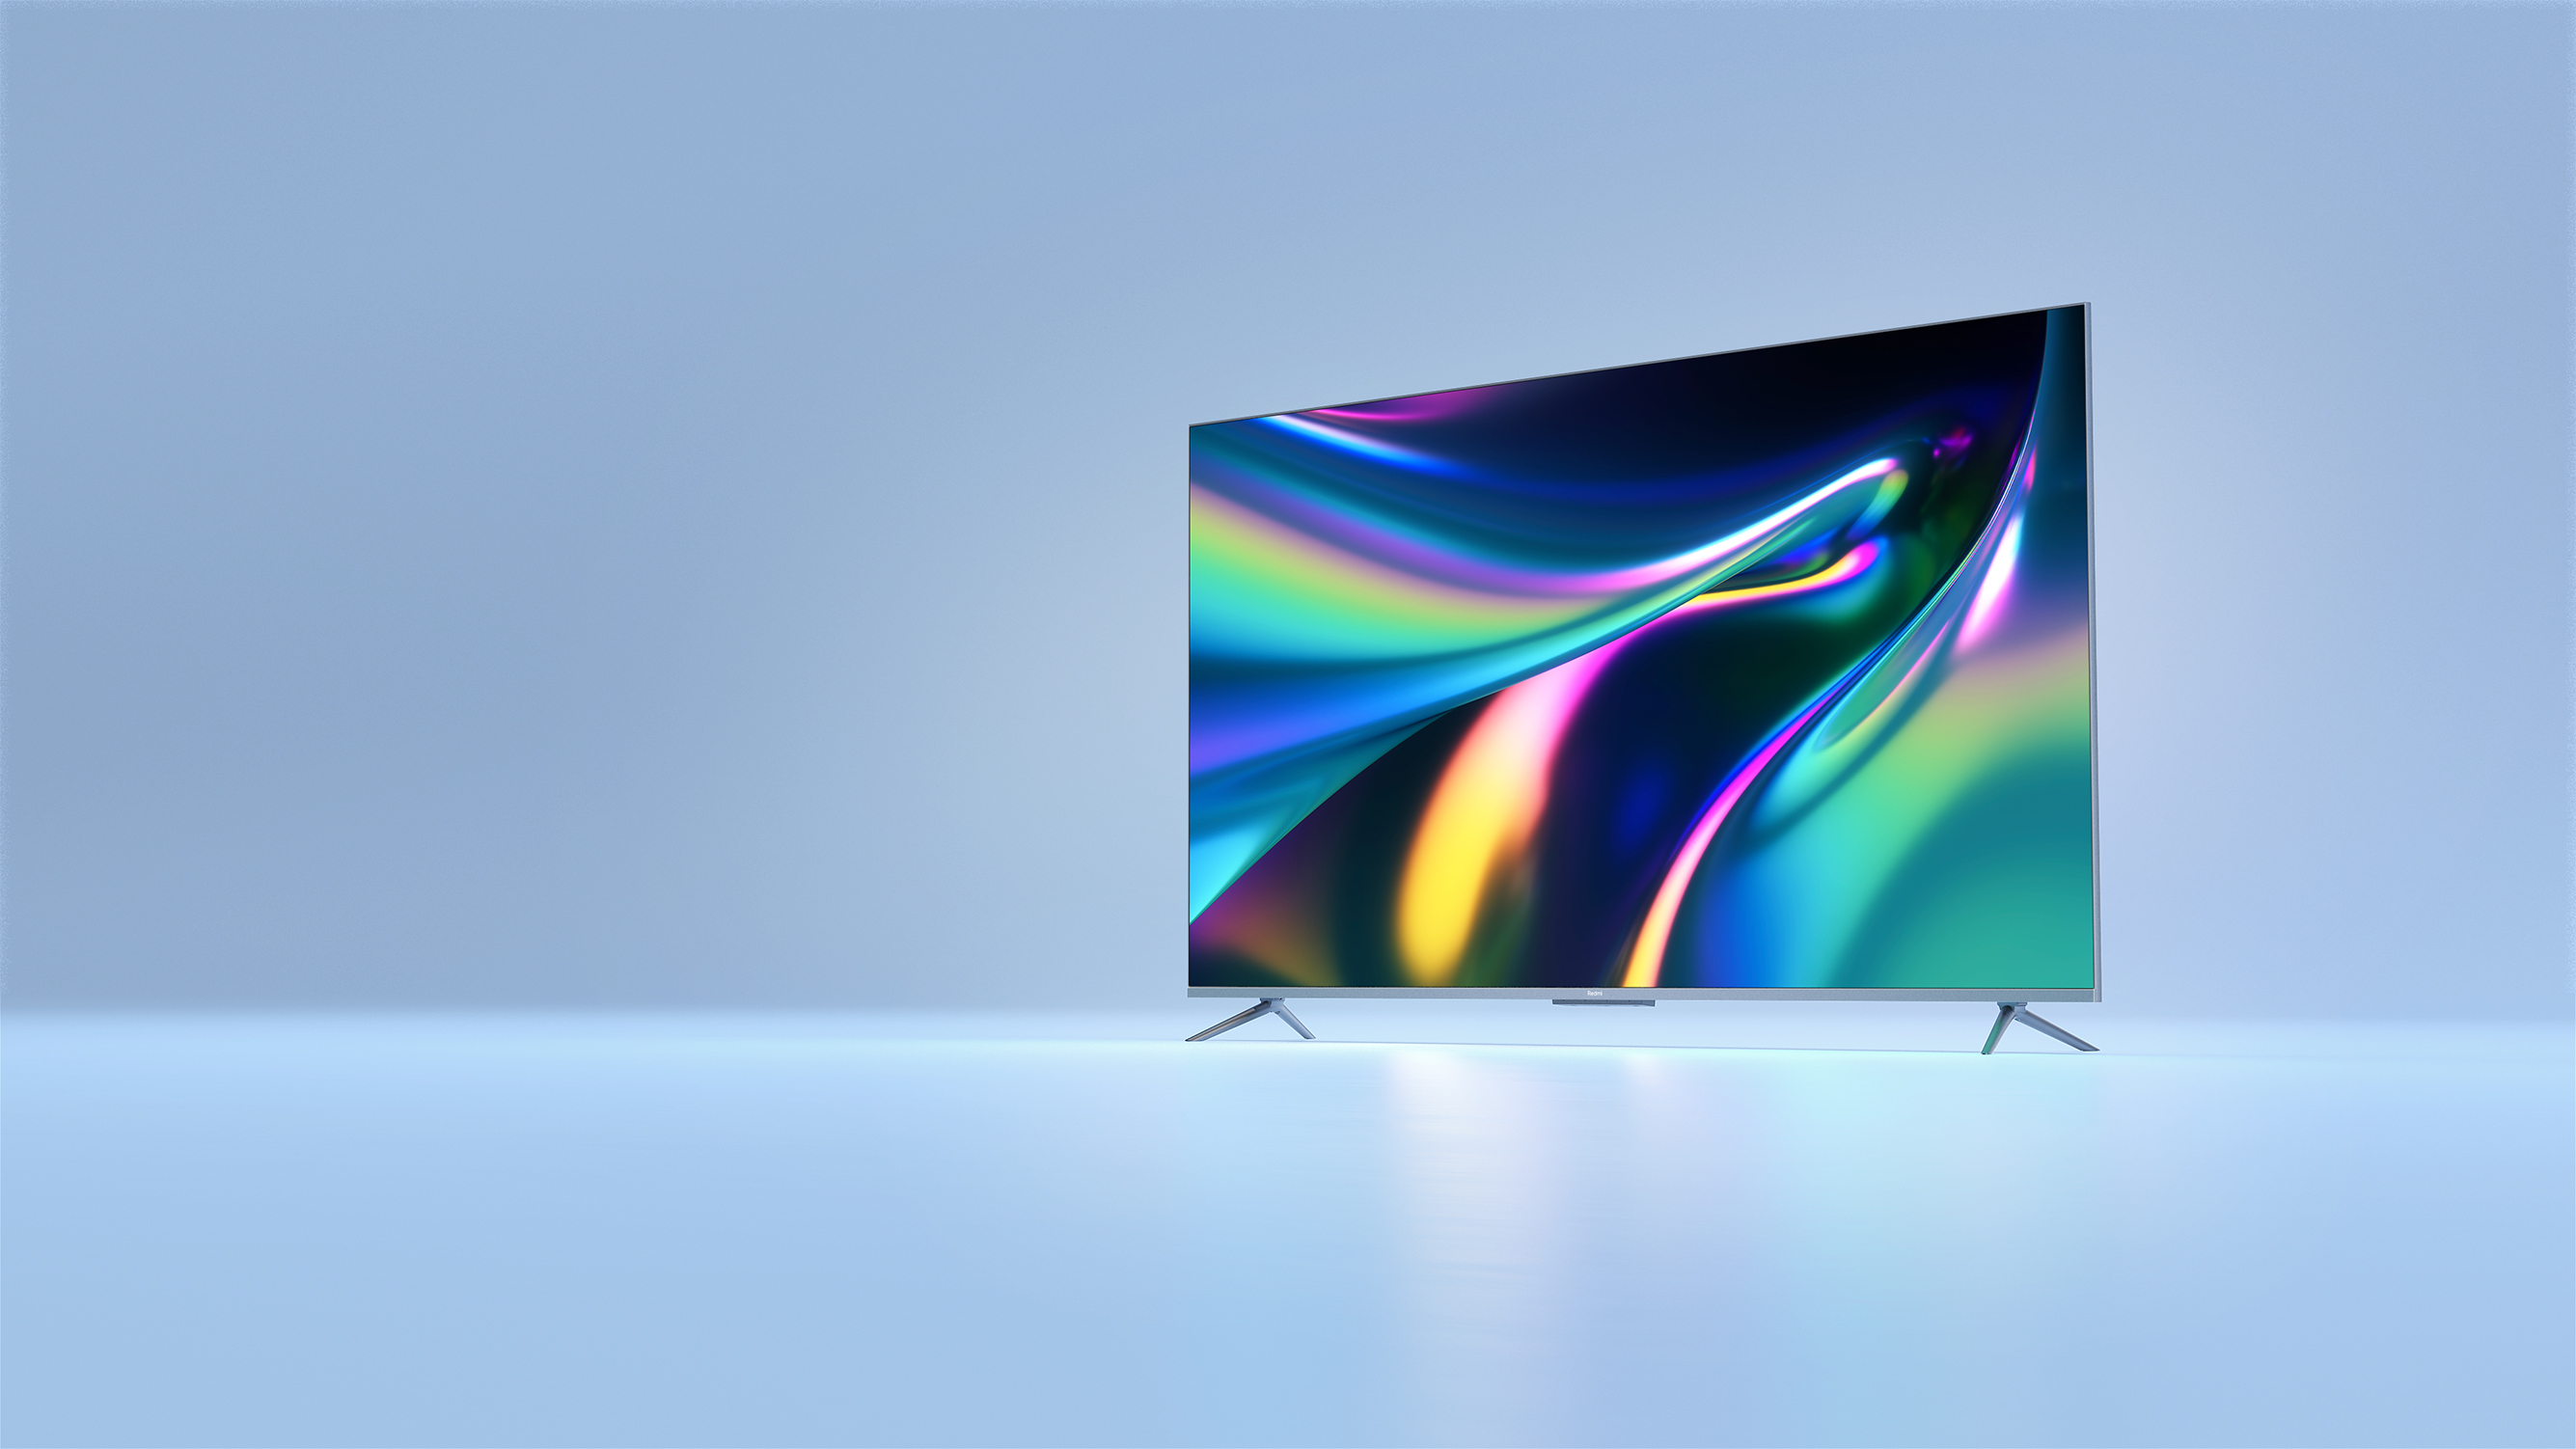 Redmi 智能电视X系列正式发布 全系金属全面屏